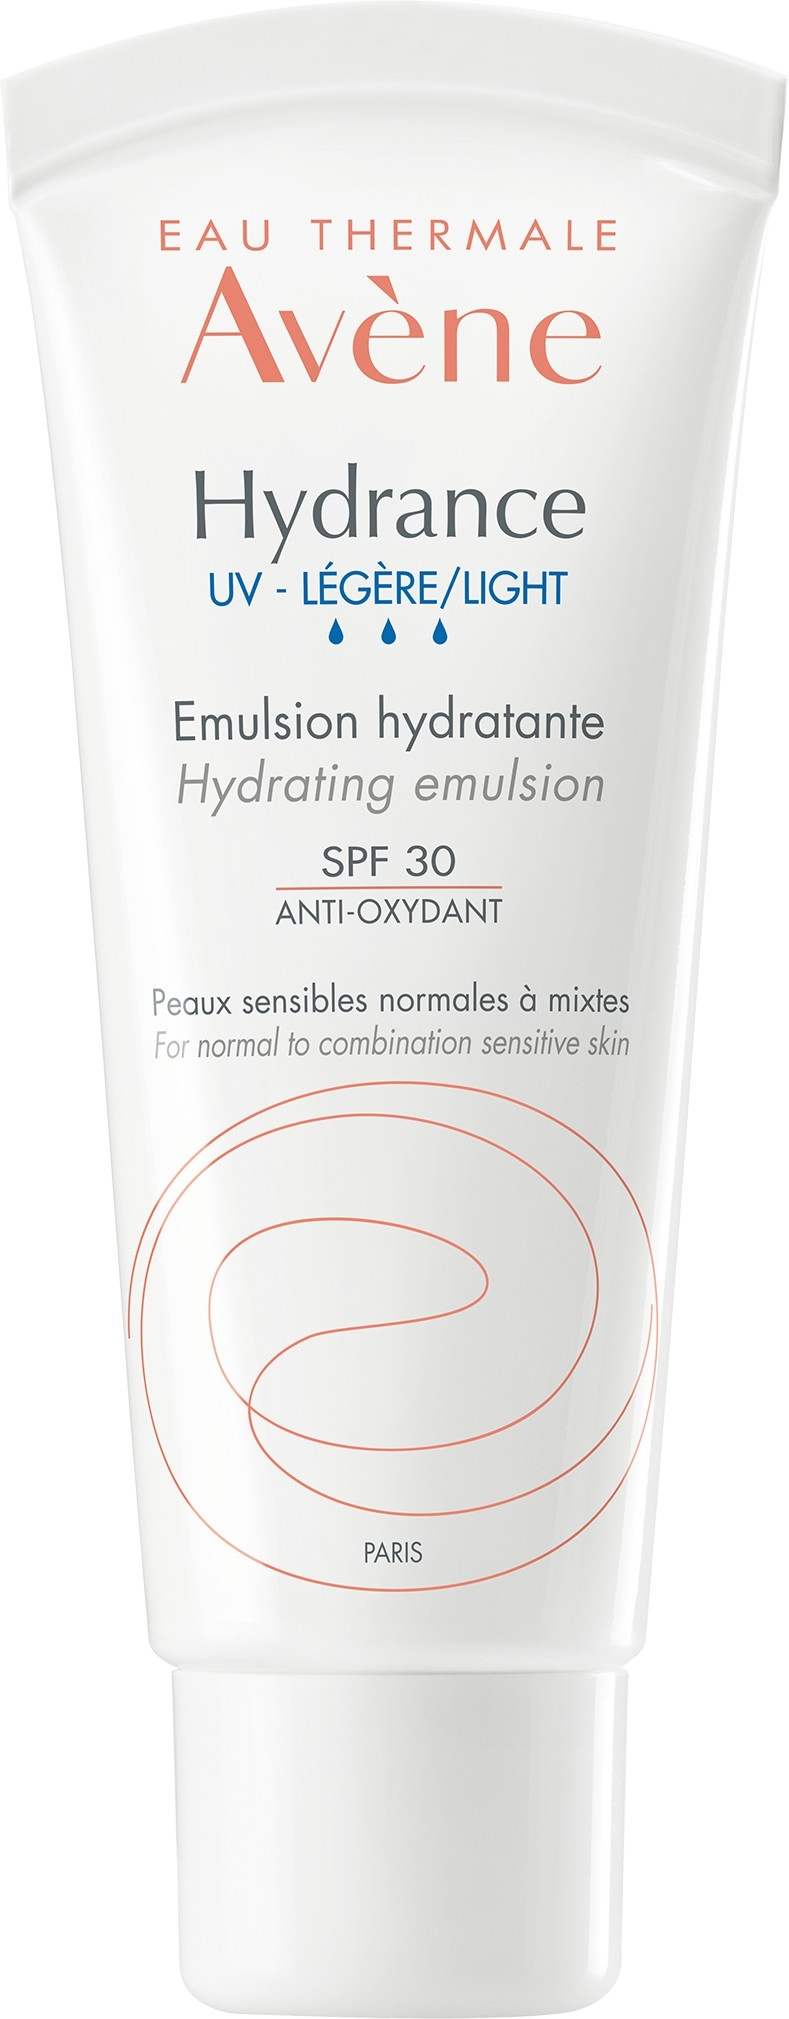 Avene Hydrance UV Light Hydrating Emulsion SPF30, 40ml